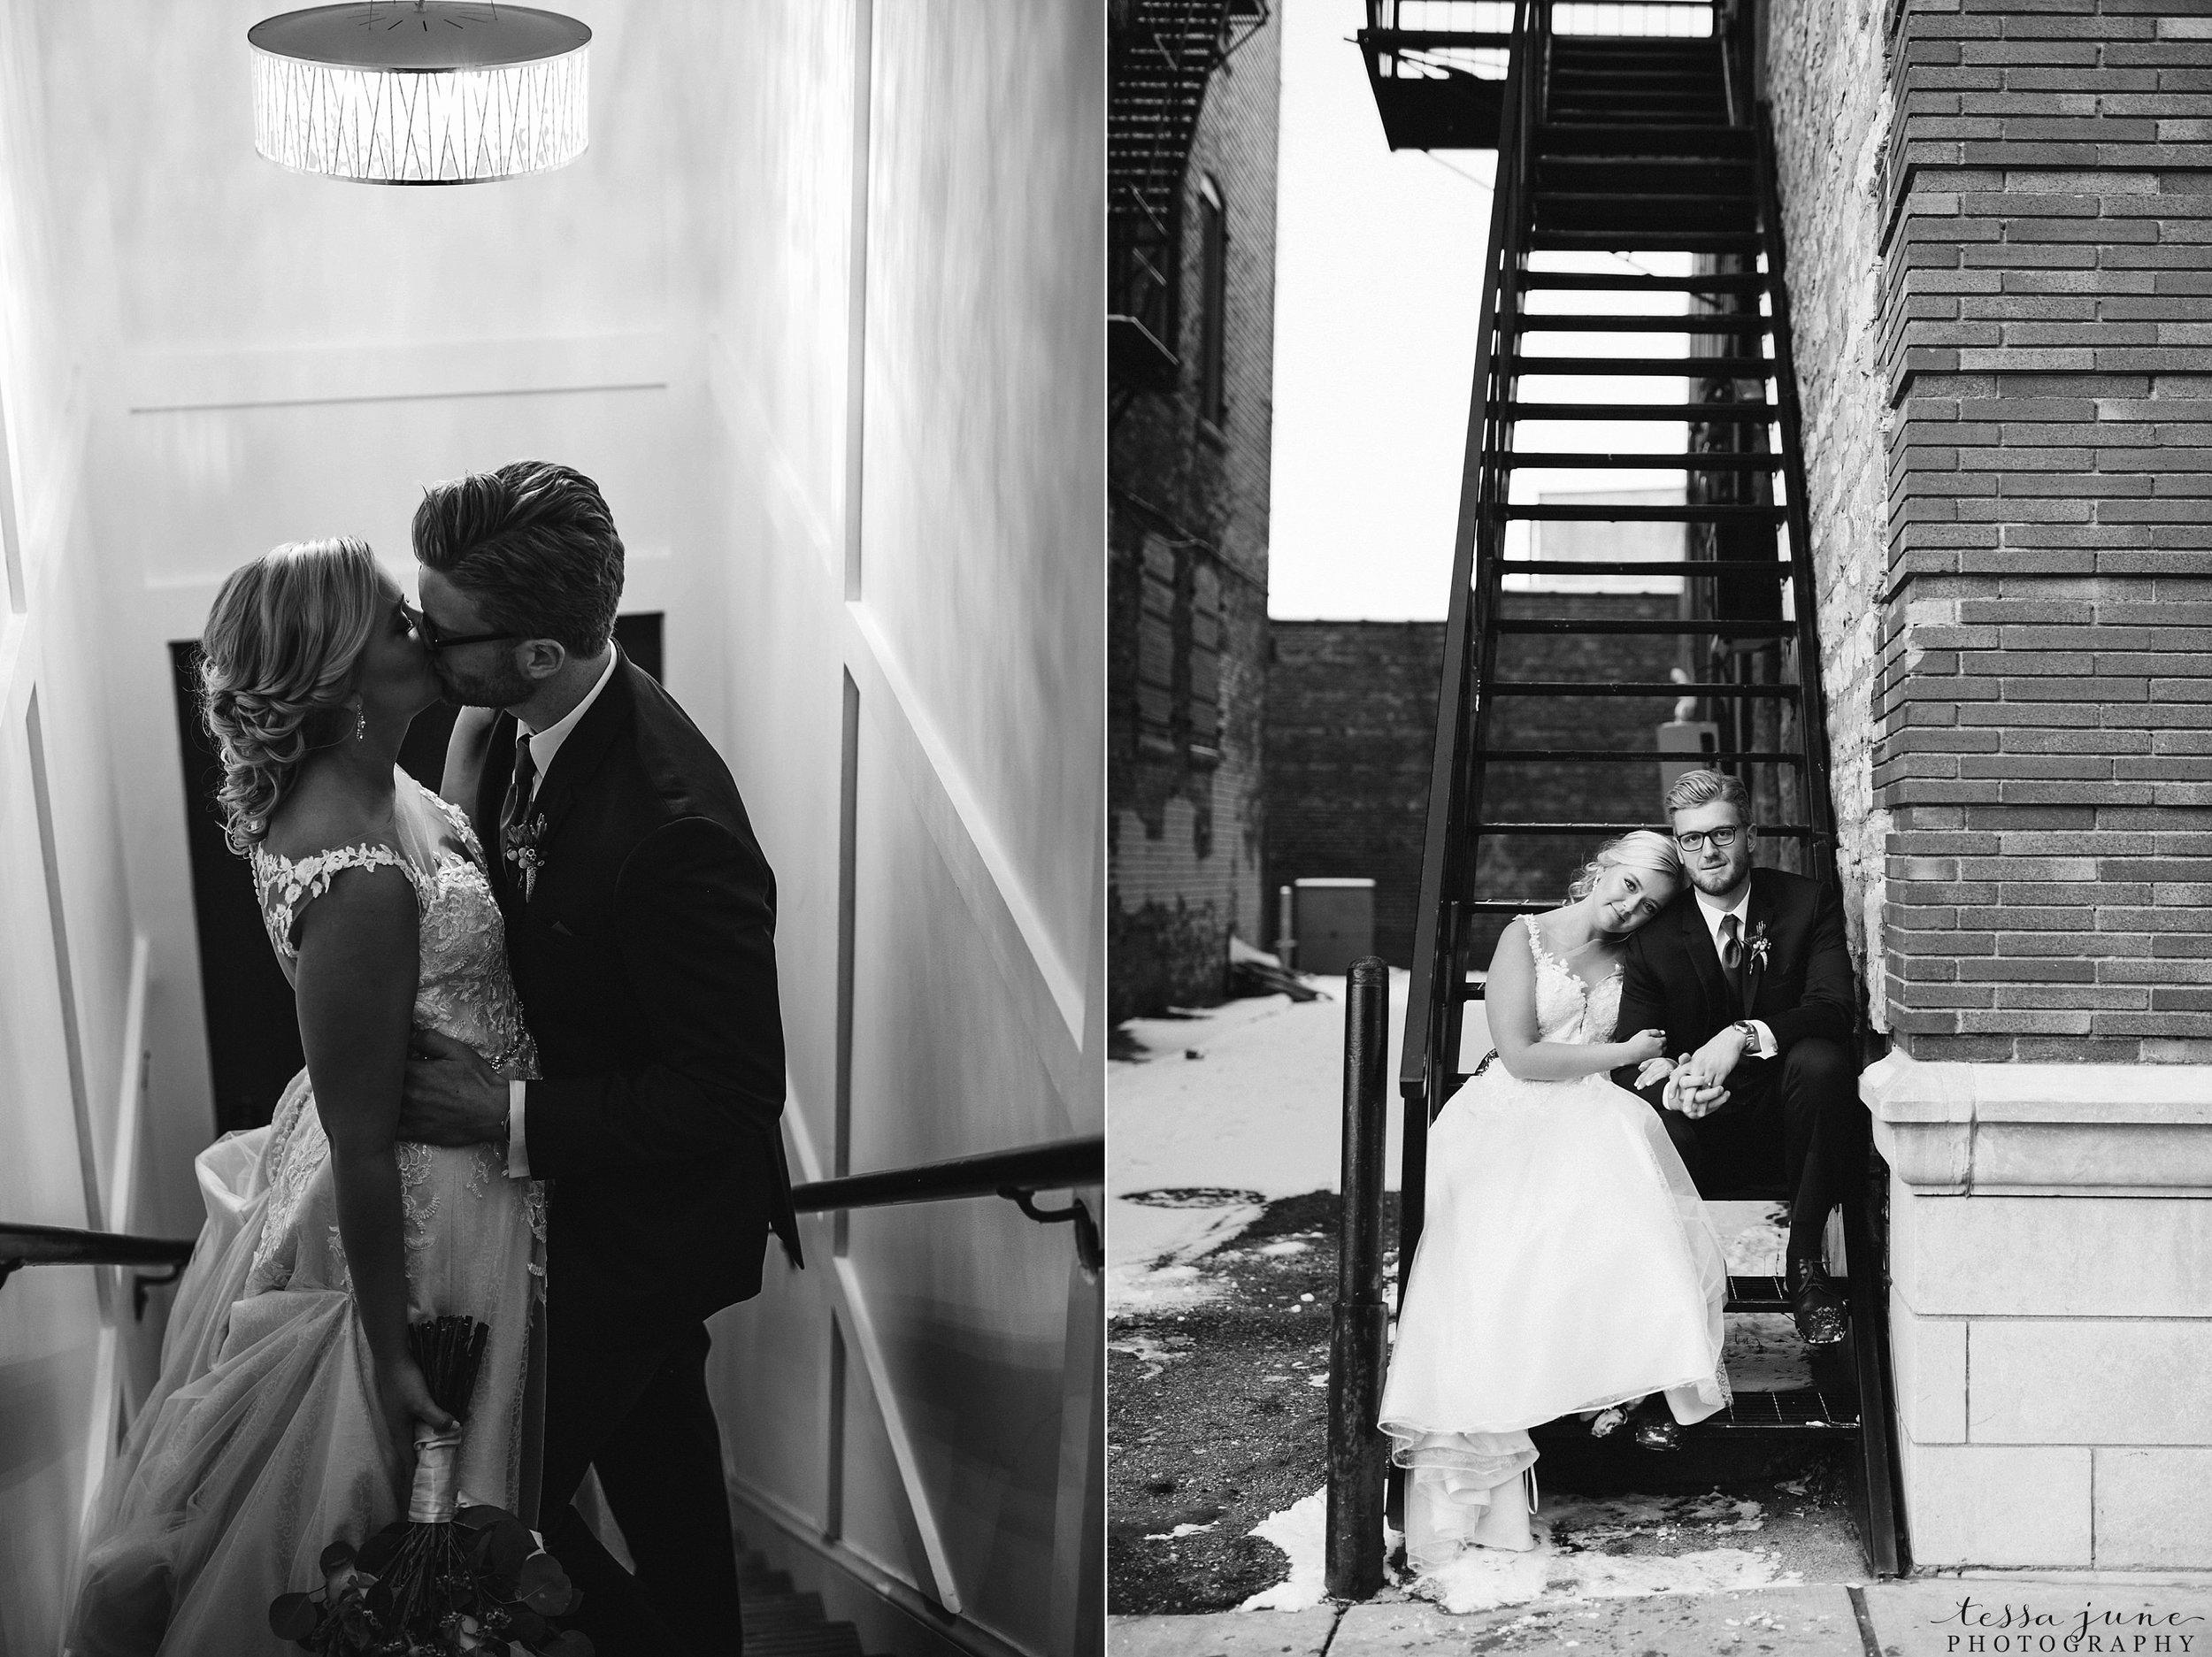 the-3-ten-event-venue-november-elegant-cozy-wedding-faribault-minnesota-49.jpg